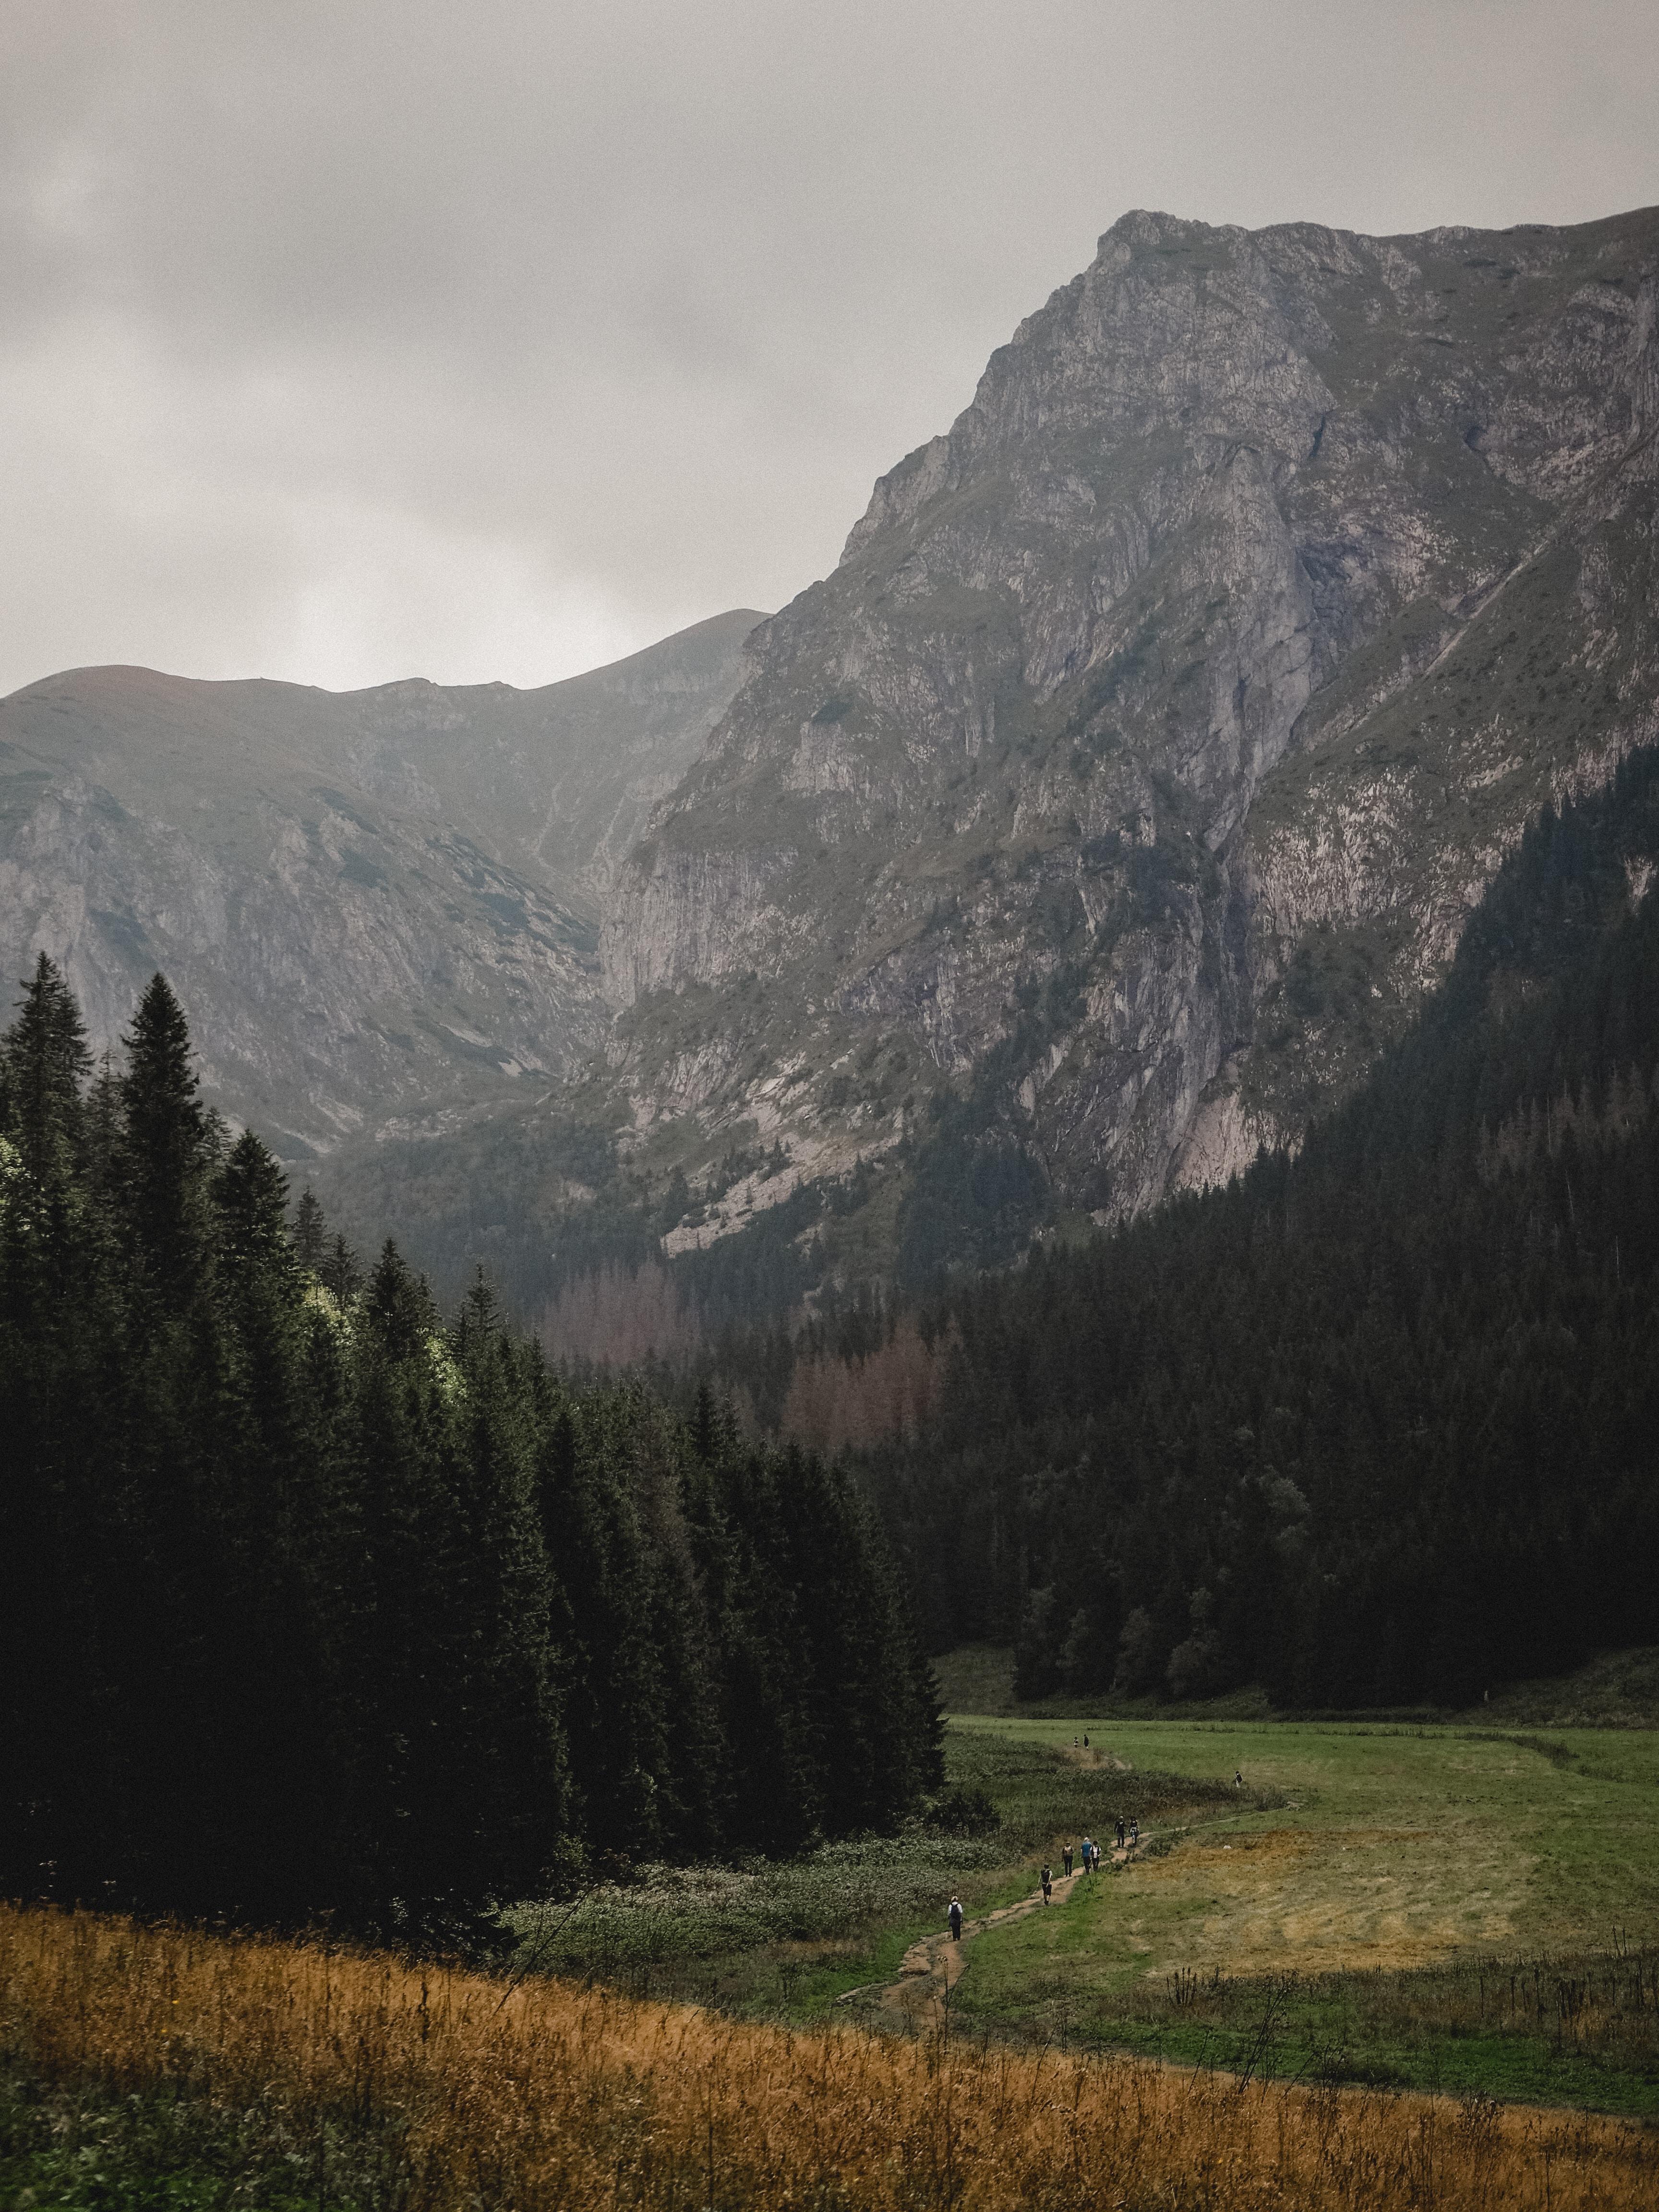 grass field near mountain